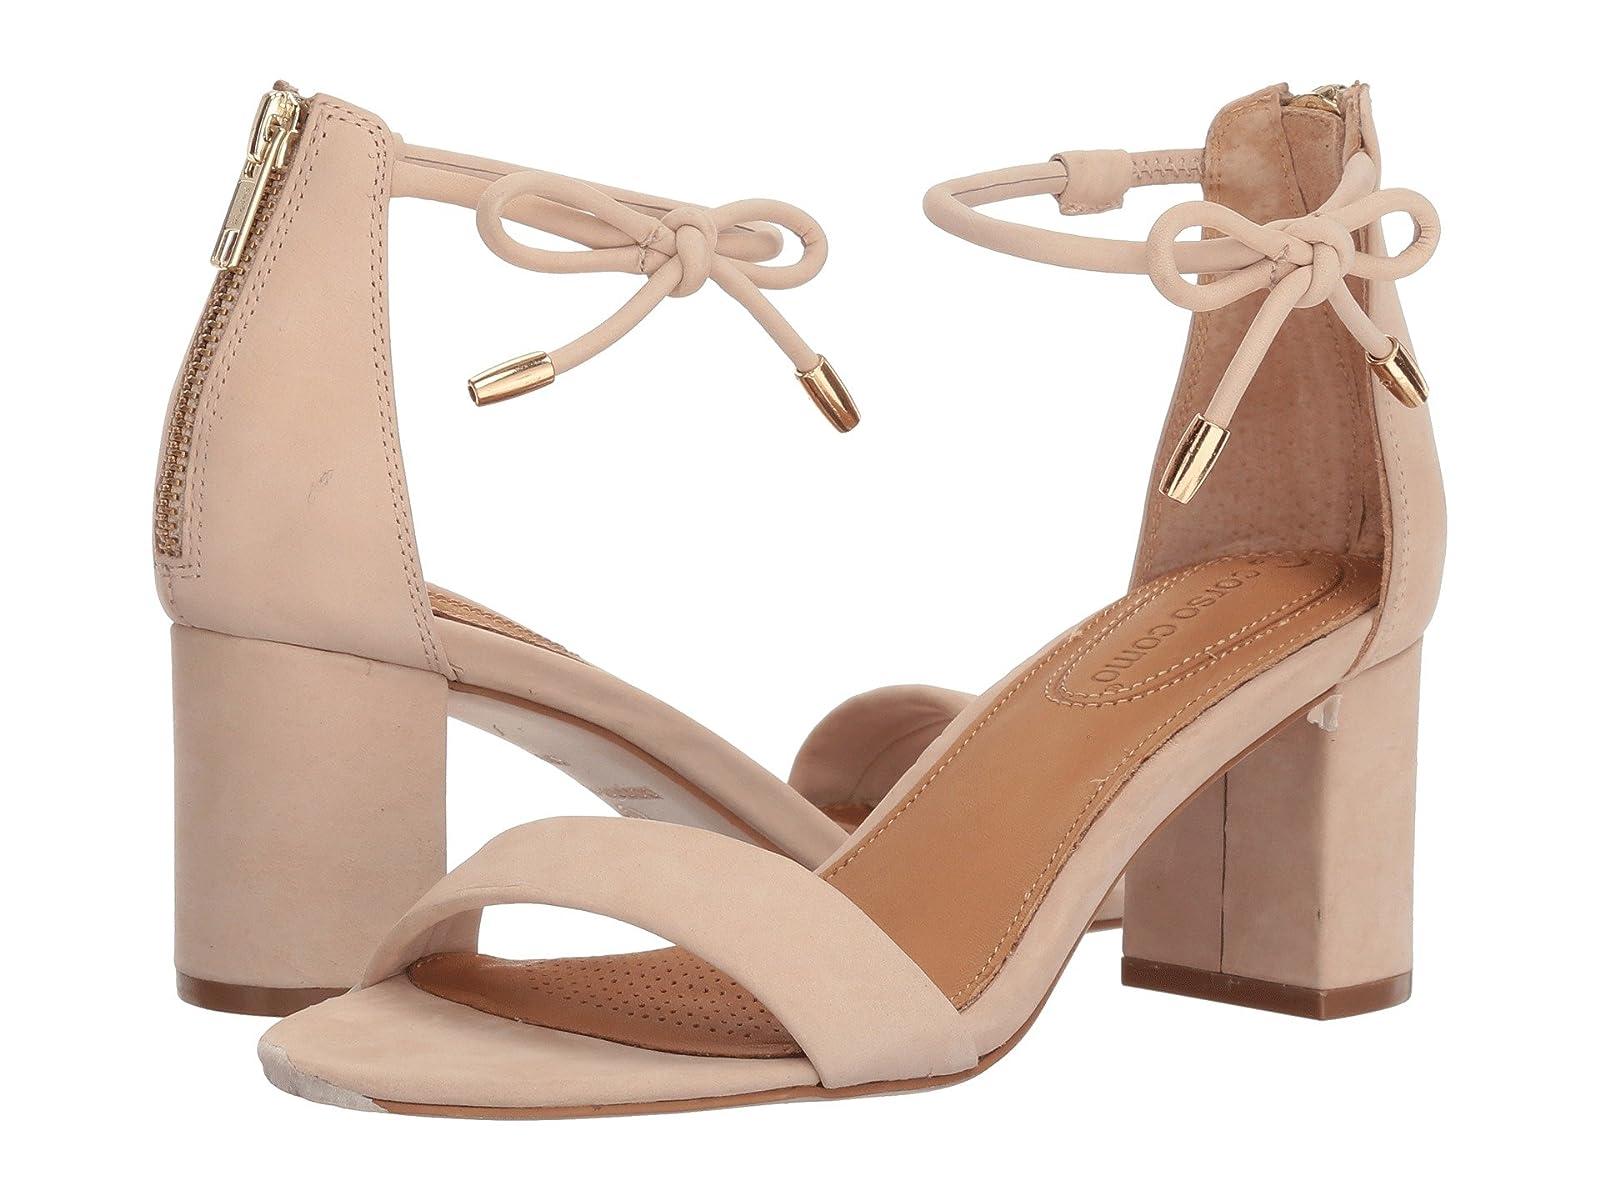 CC Corso Como CelebraytAtmospheric grades have affordable shoes